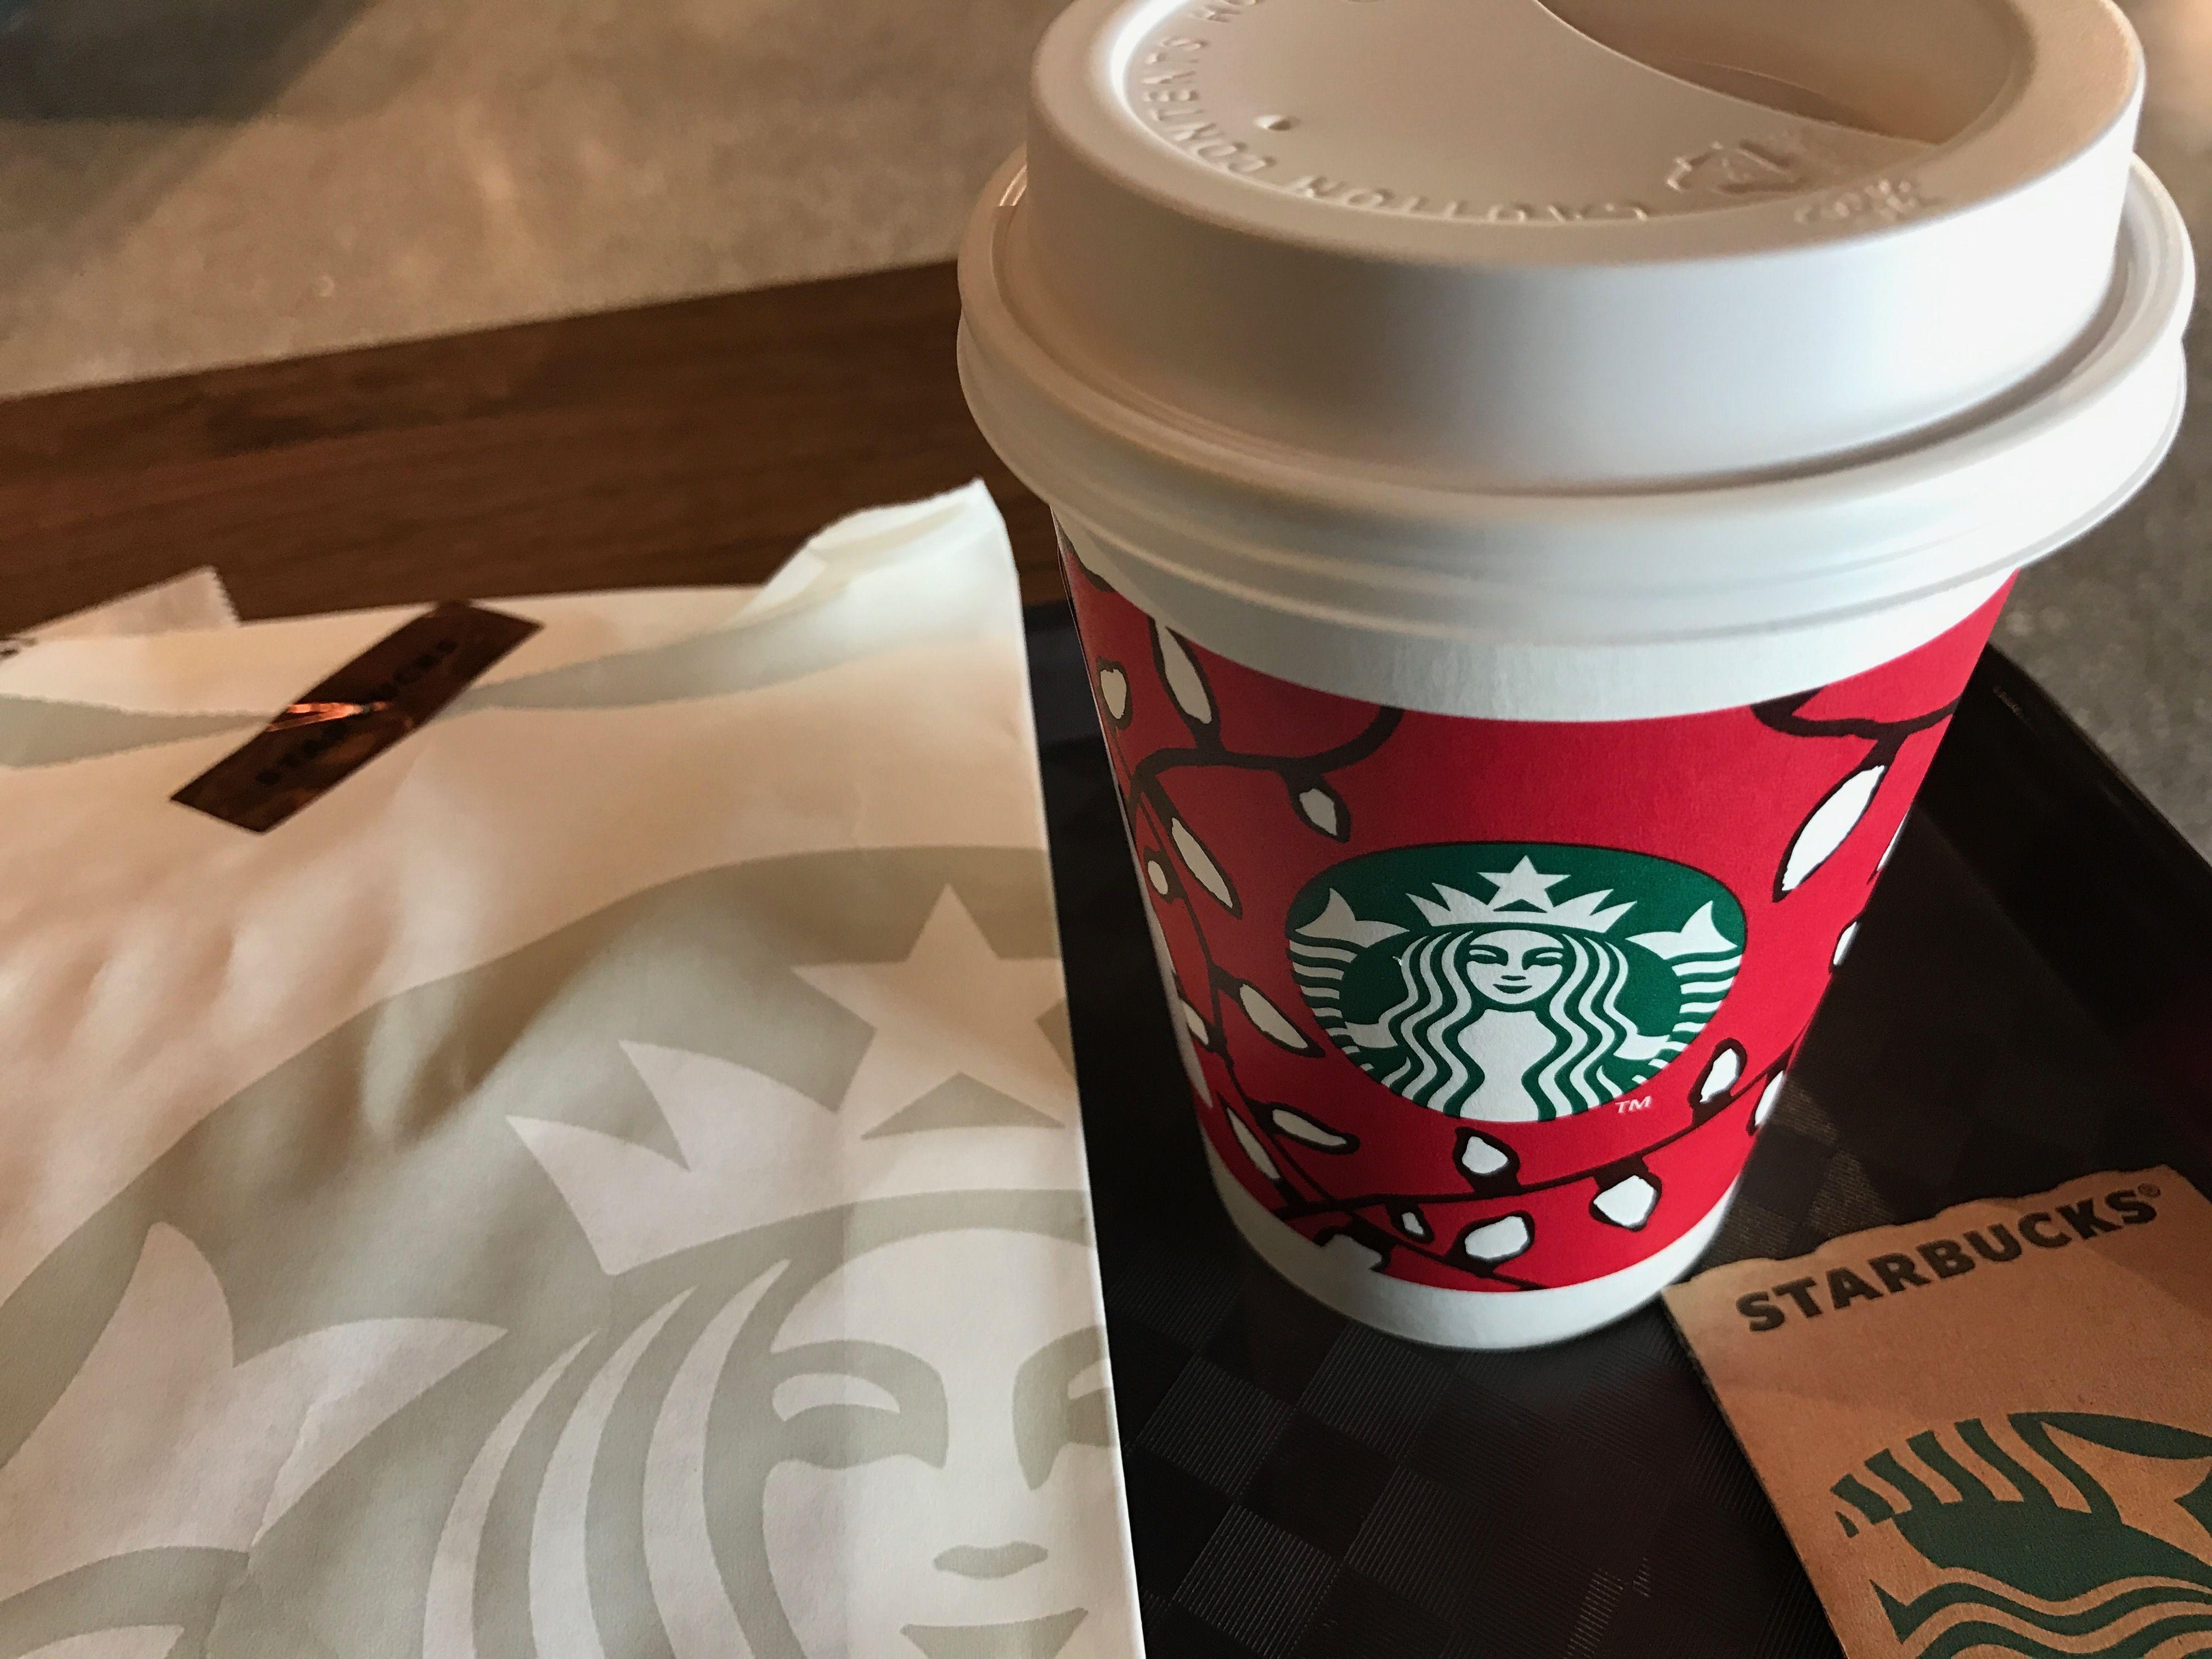 Flat white @ Starbucks Shanghai Disneytown